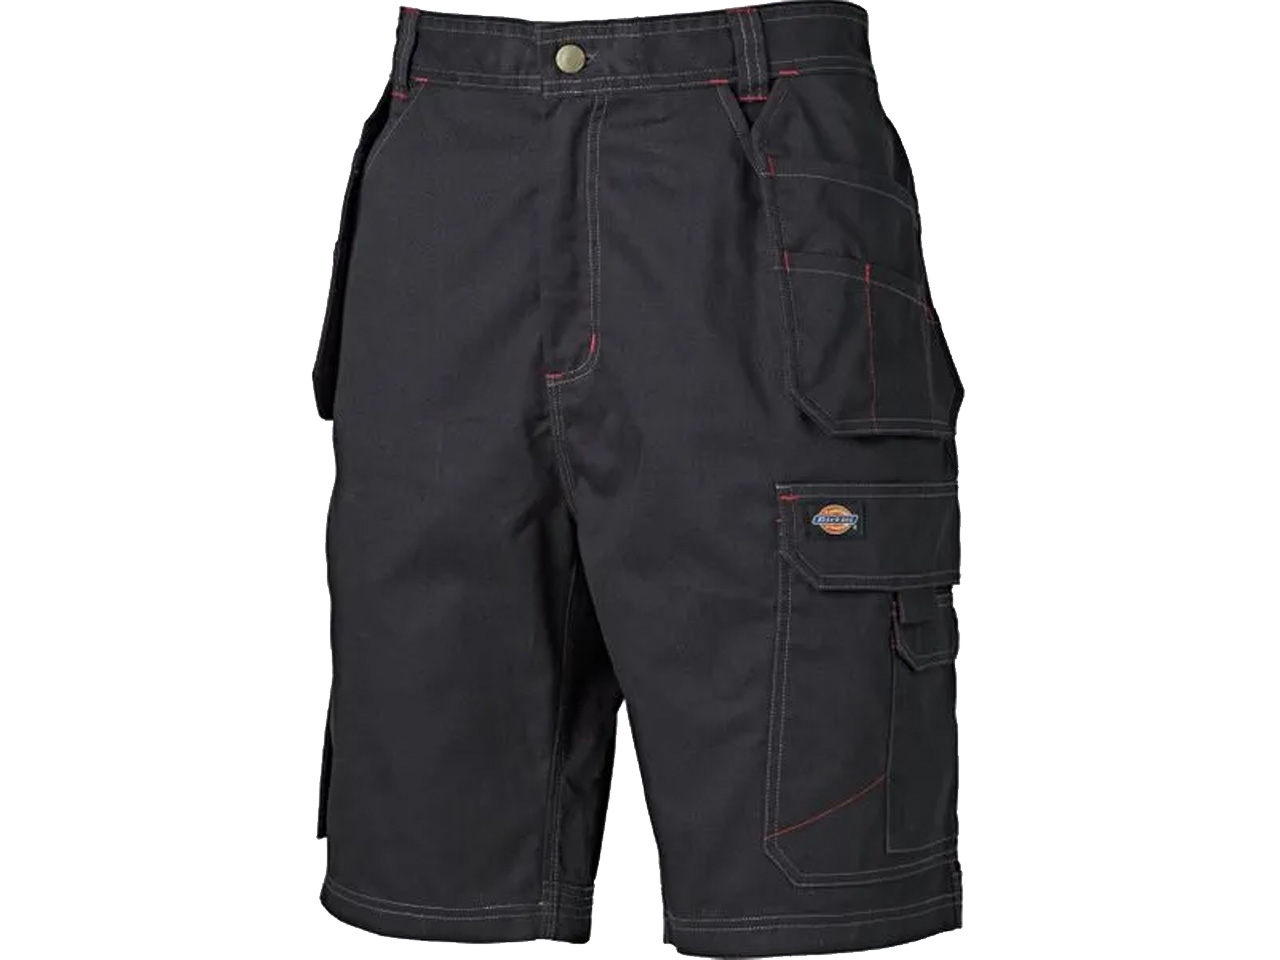 Black Dickies WD802 BK 33 Size 48 Redhawk Pro Short